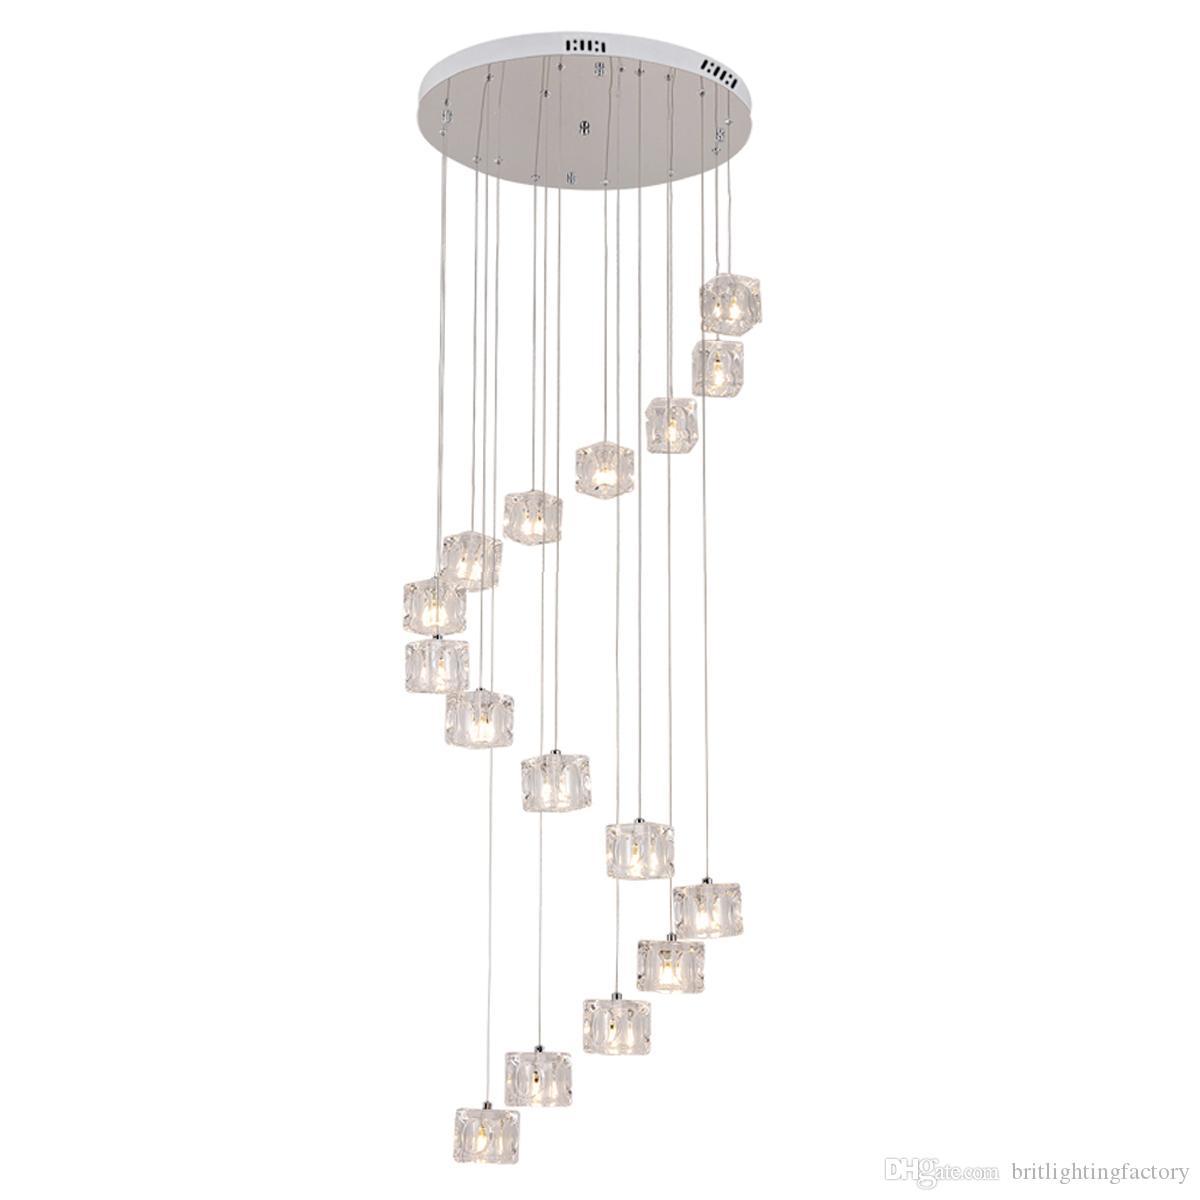 Lampade a sospensione lunghe a LED Sala da pranzo moderna hotel Hall Mall droplight creative girevoli a doppia scala Lampade a sospensione